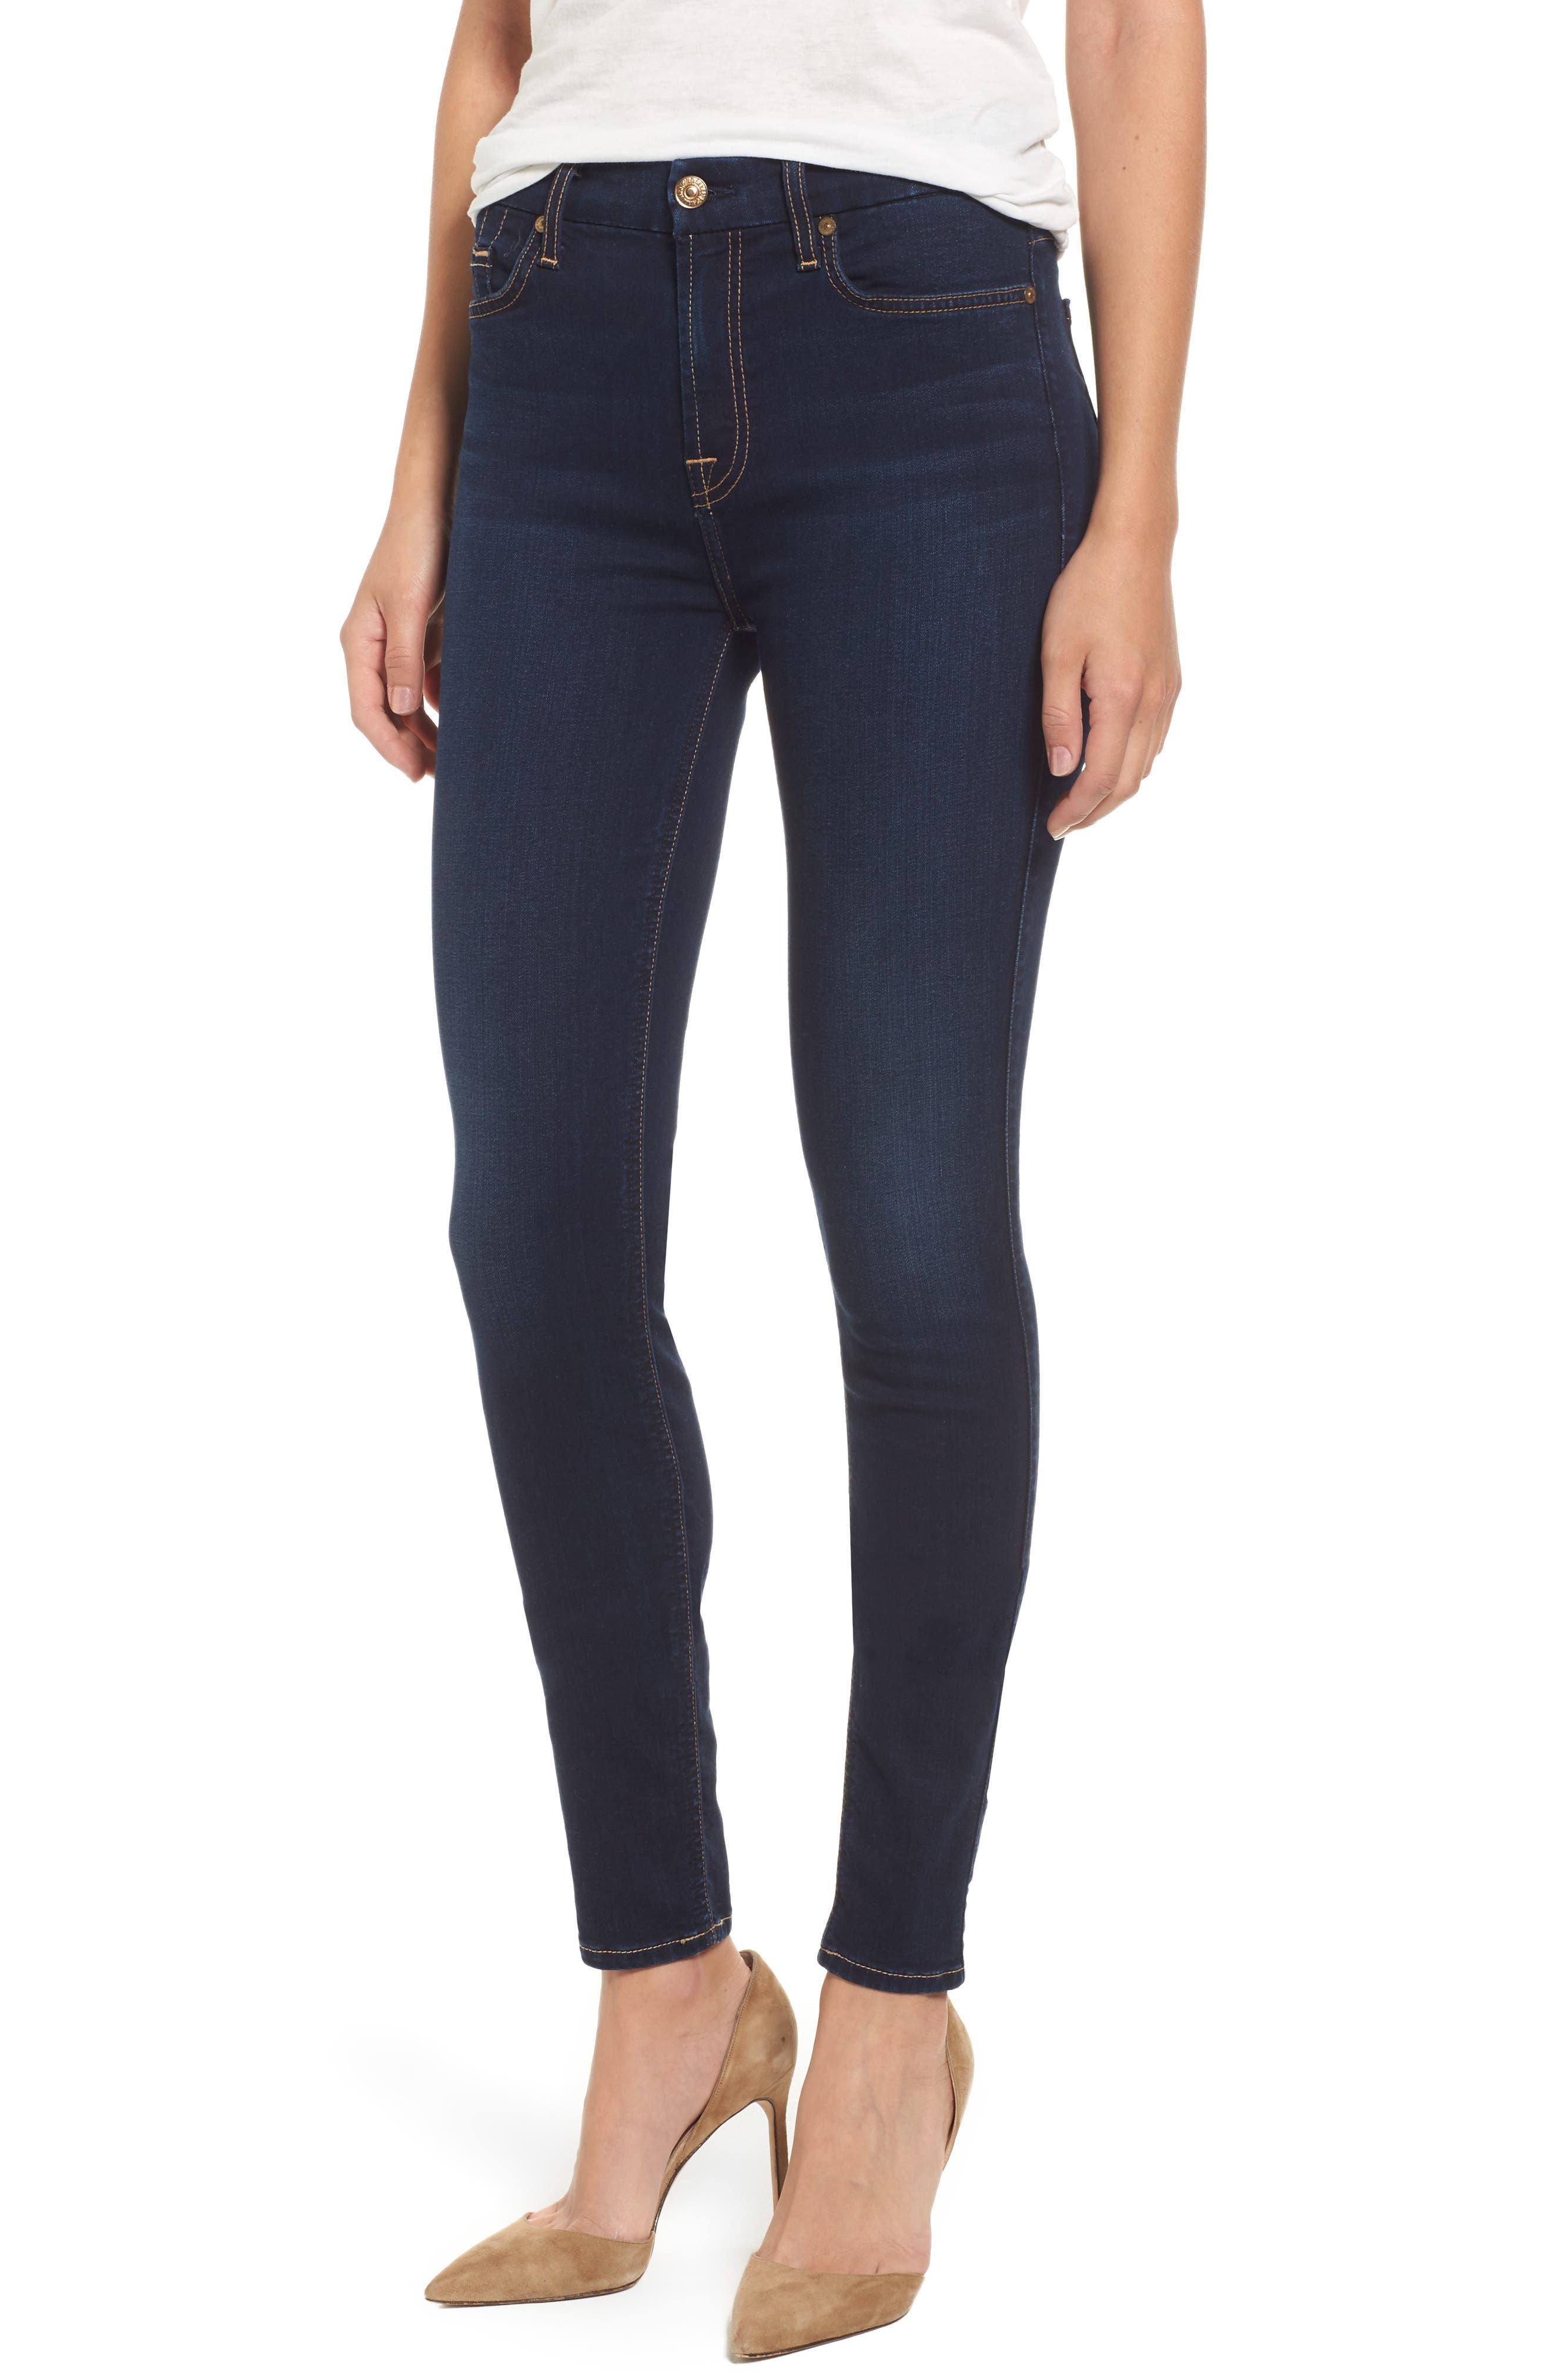 b(air) High Waist Skinny Jeans,                         Main,                         color, B(Air) Tranquil Blue